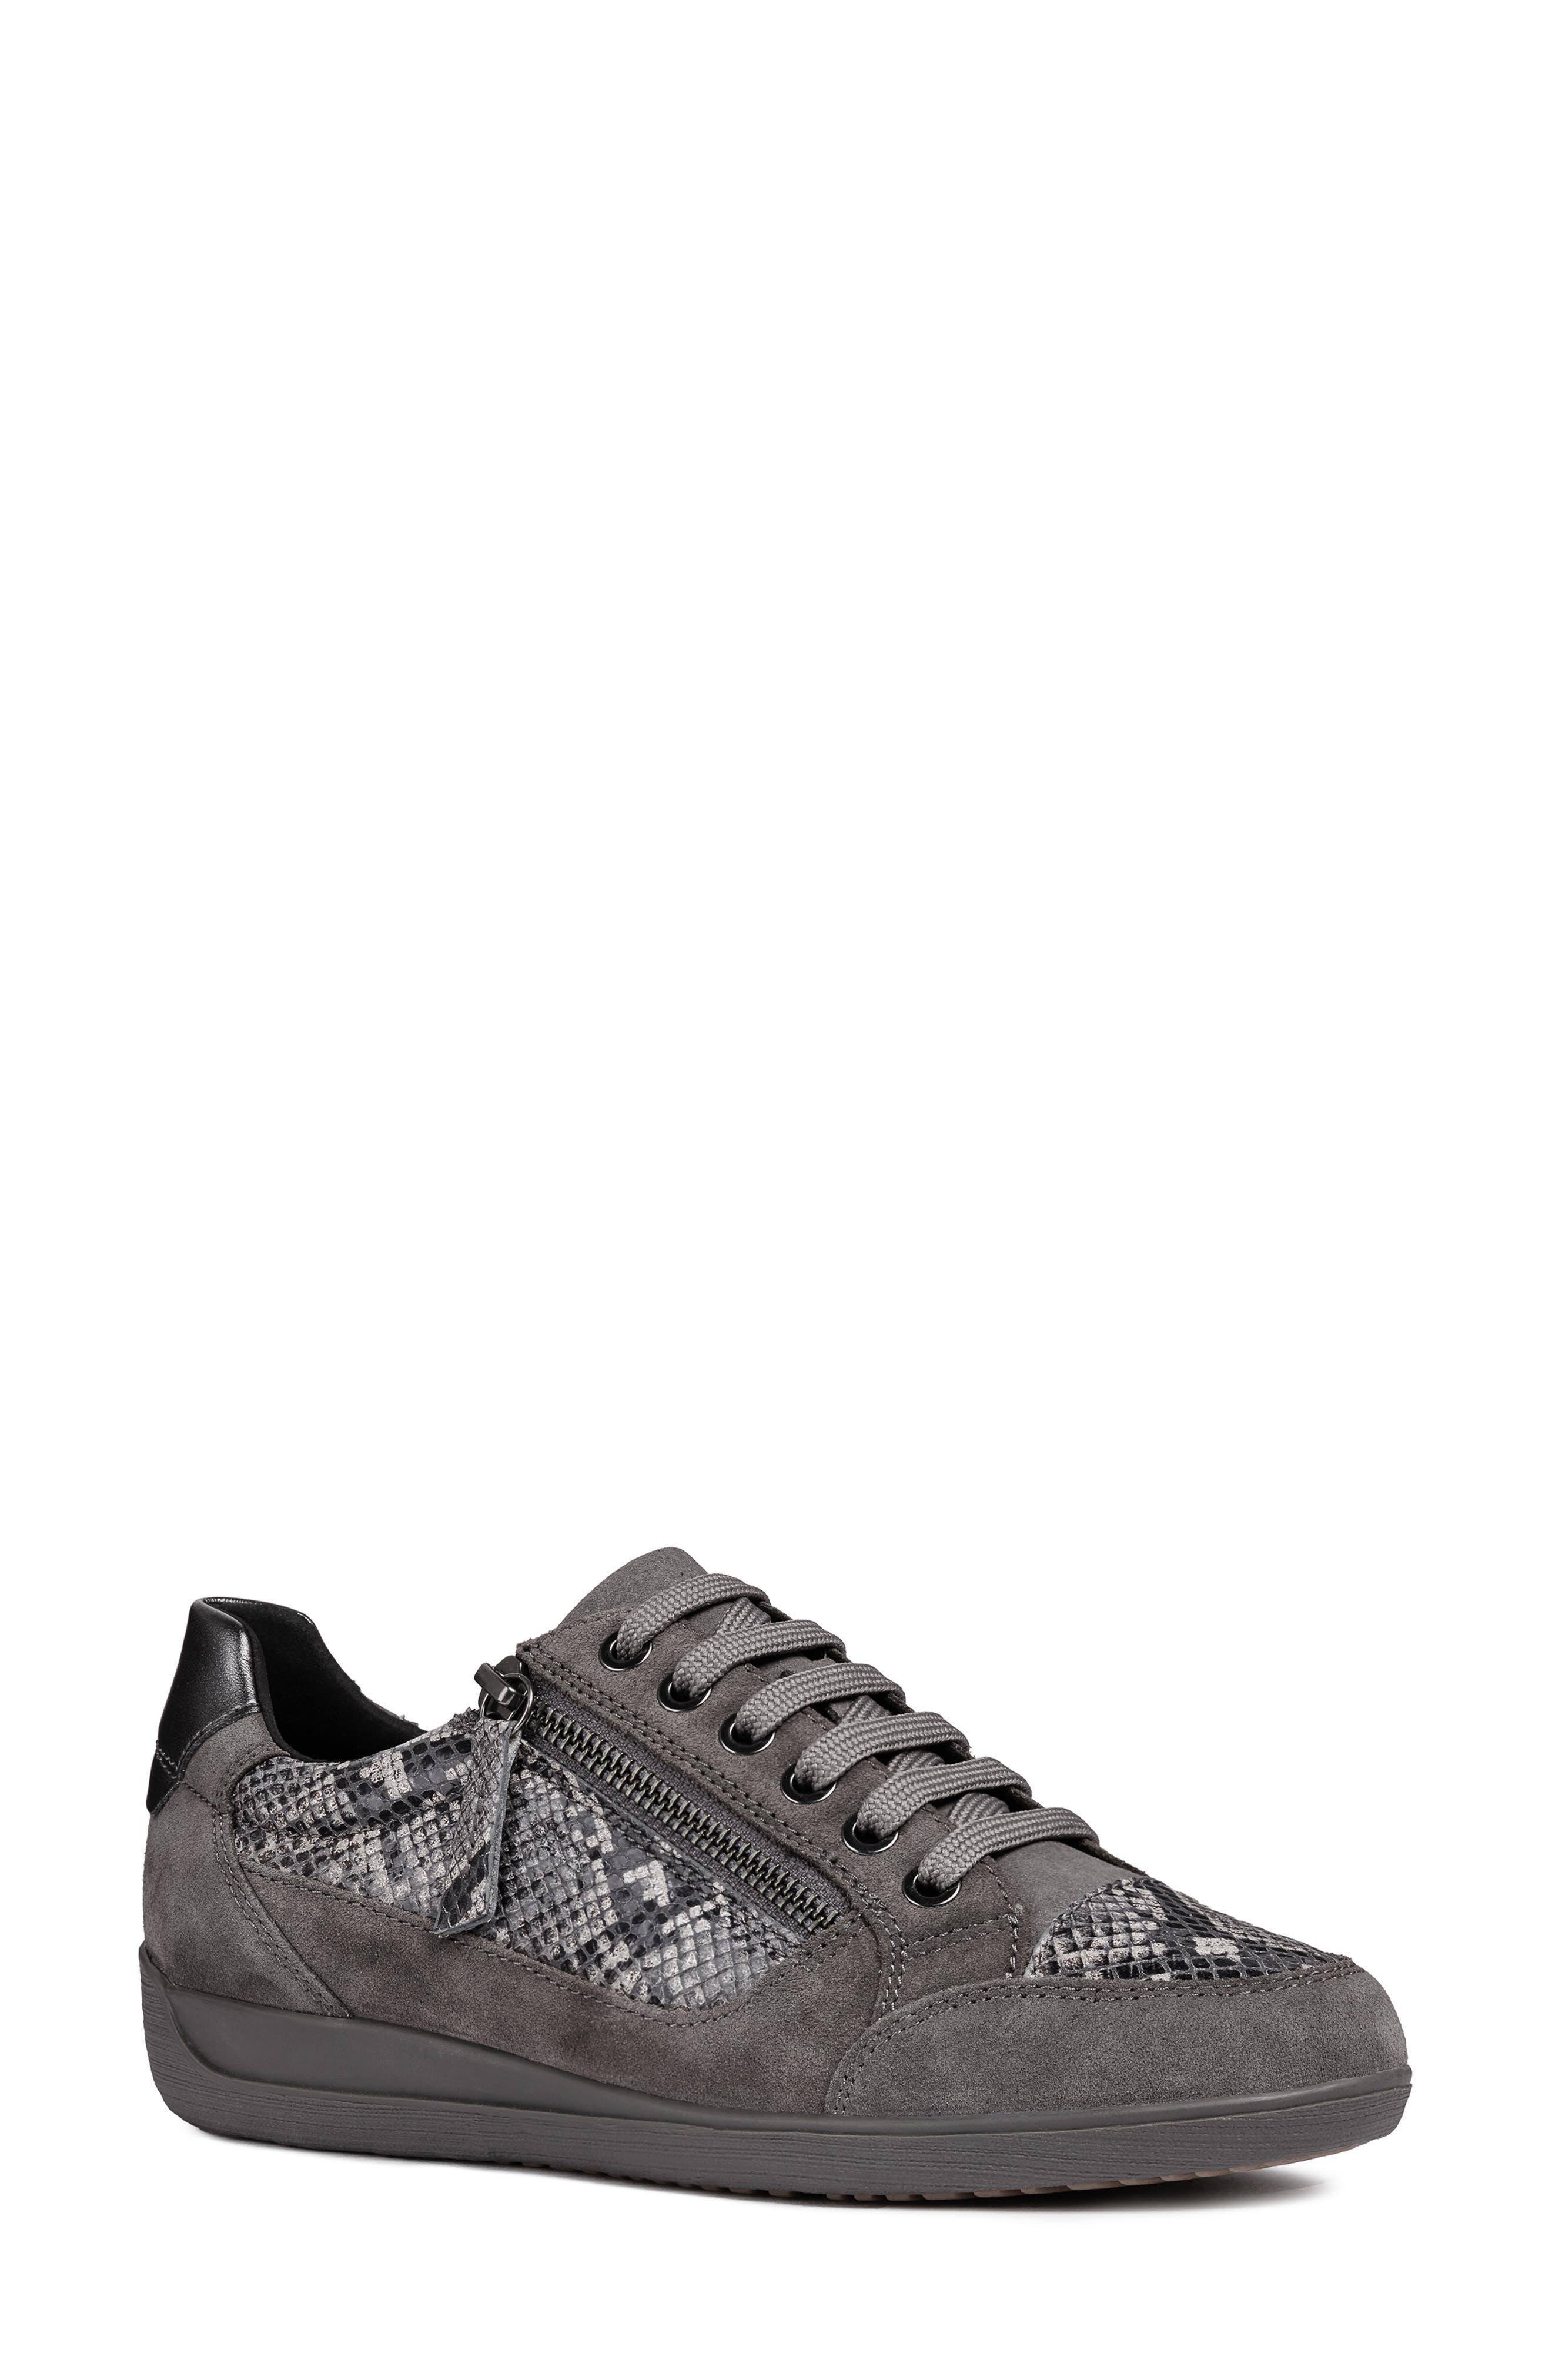 Myria Sneaker,                             Main thumbnail 1, color,                             DARK GREY SUEDE